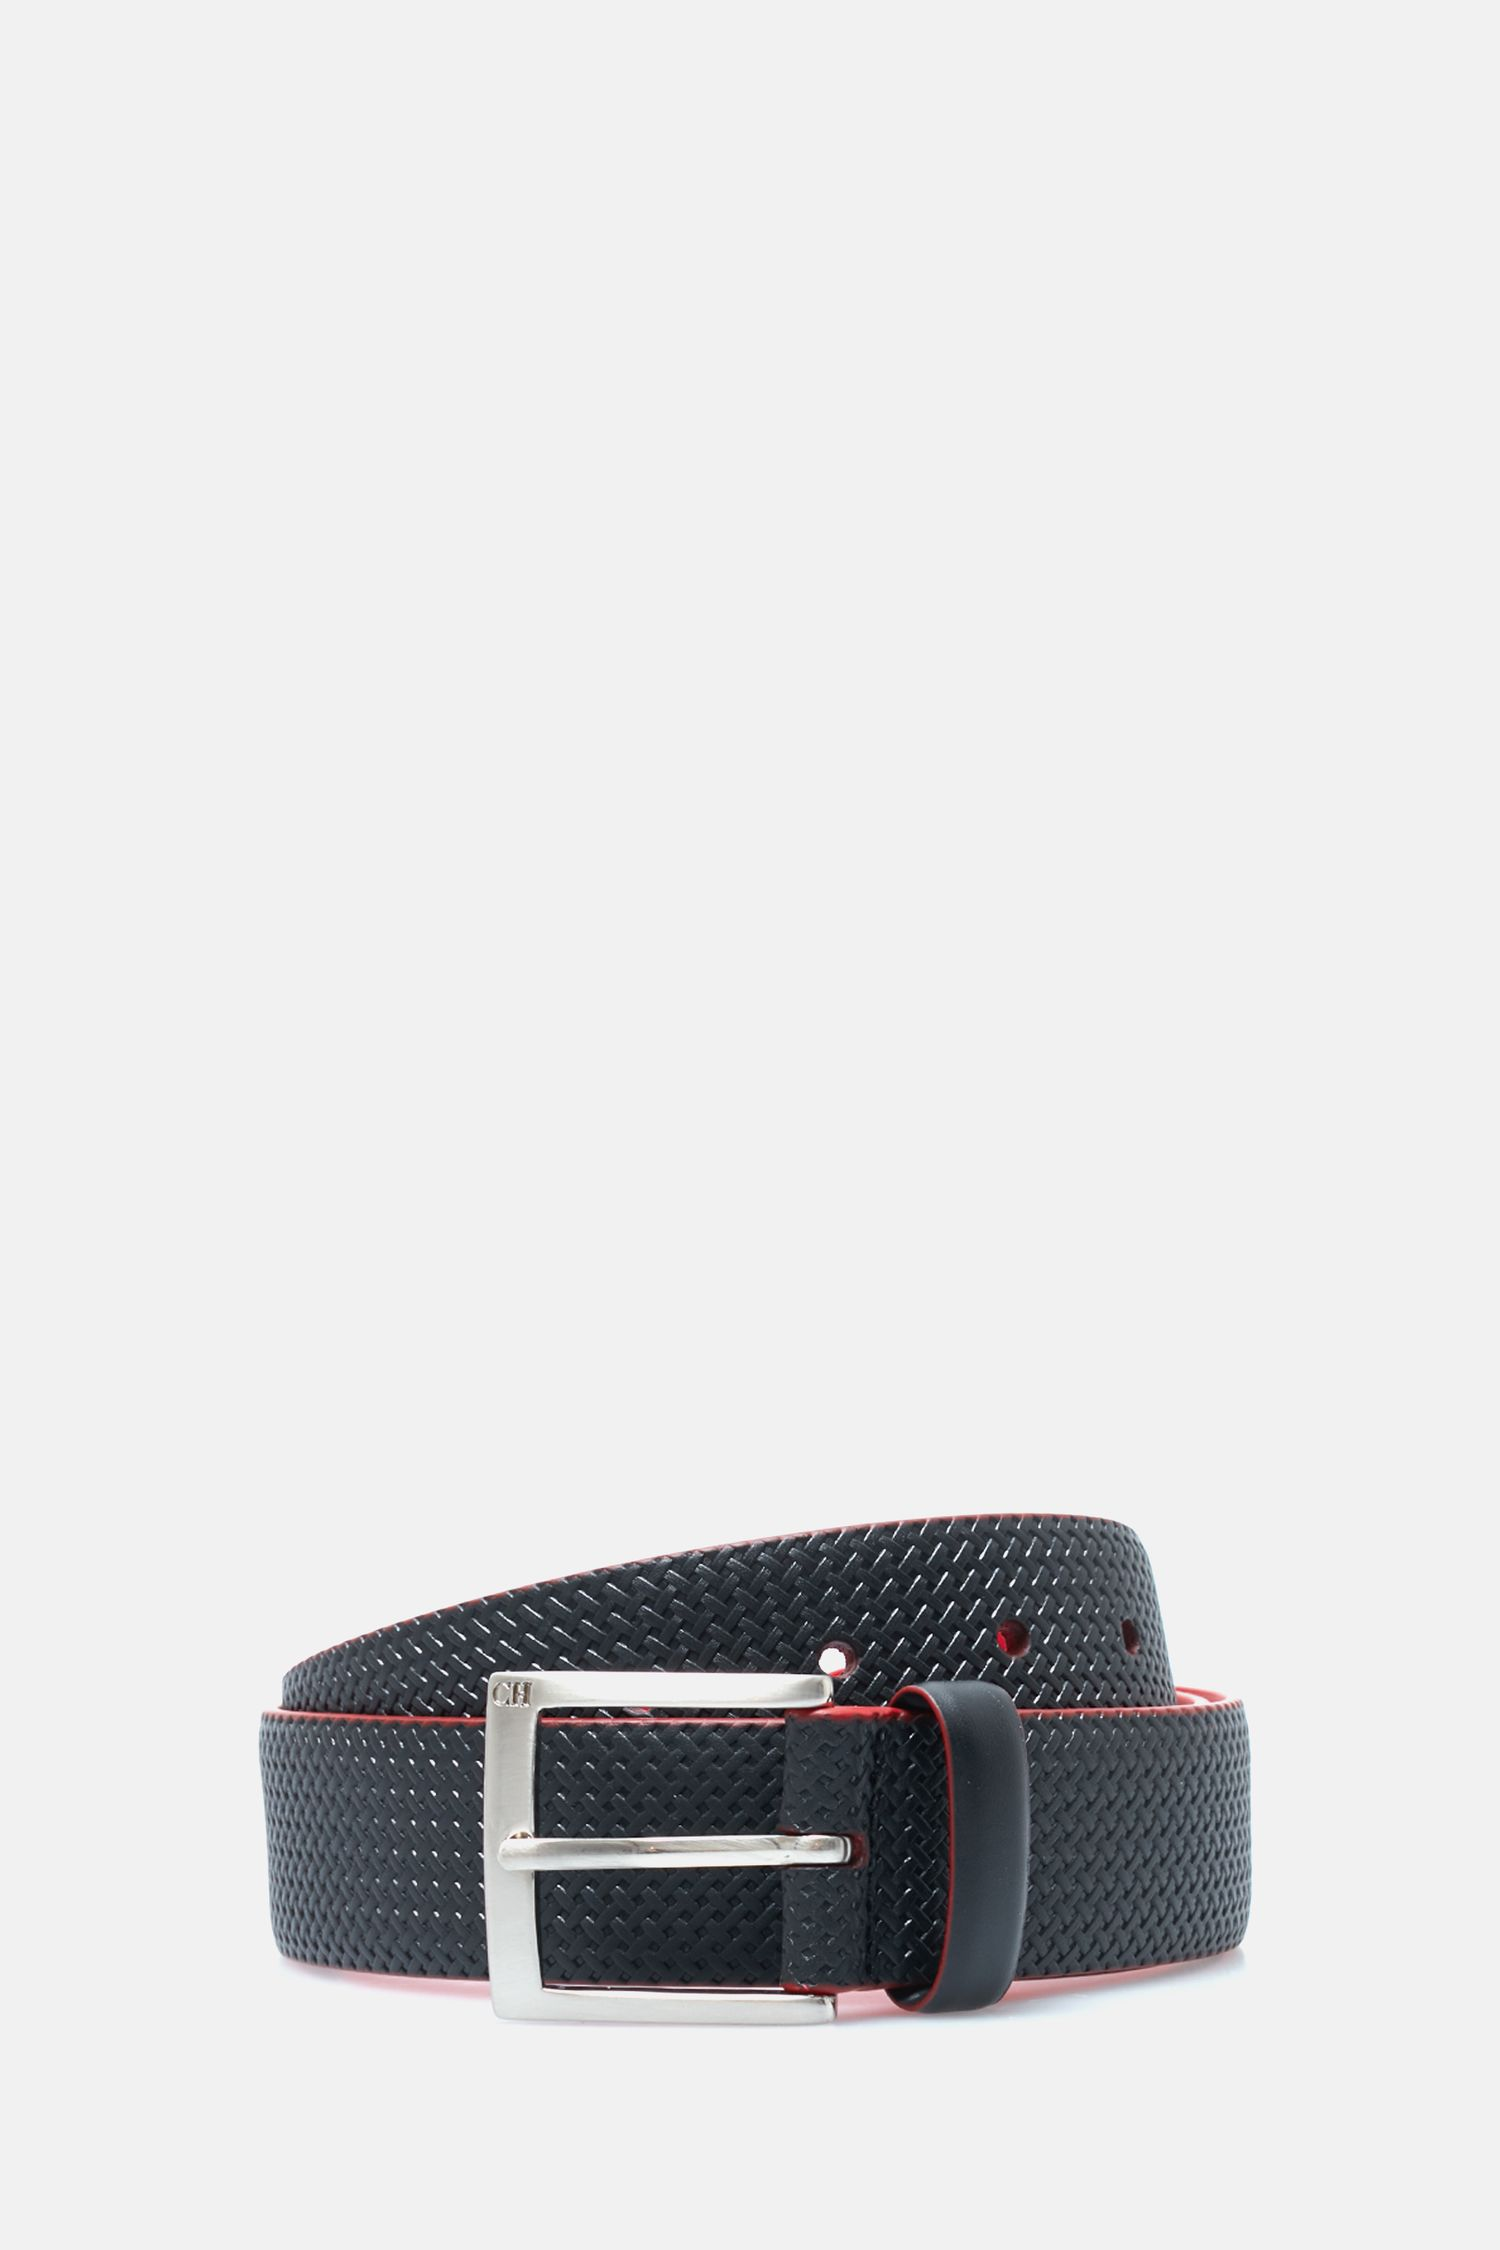 Woven-effect leather belt